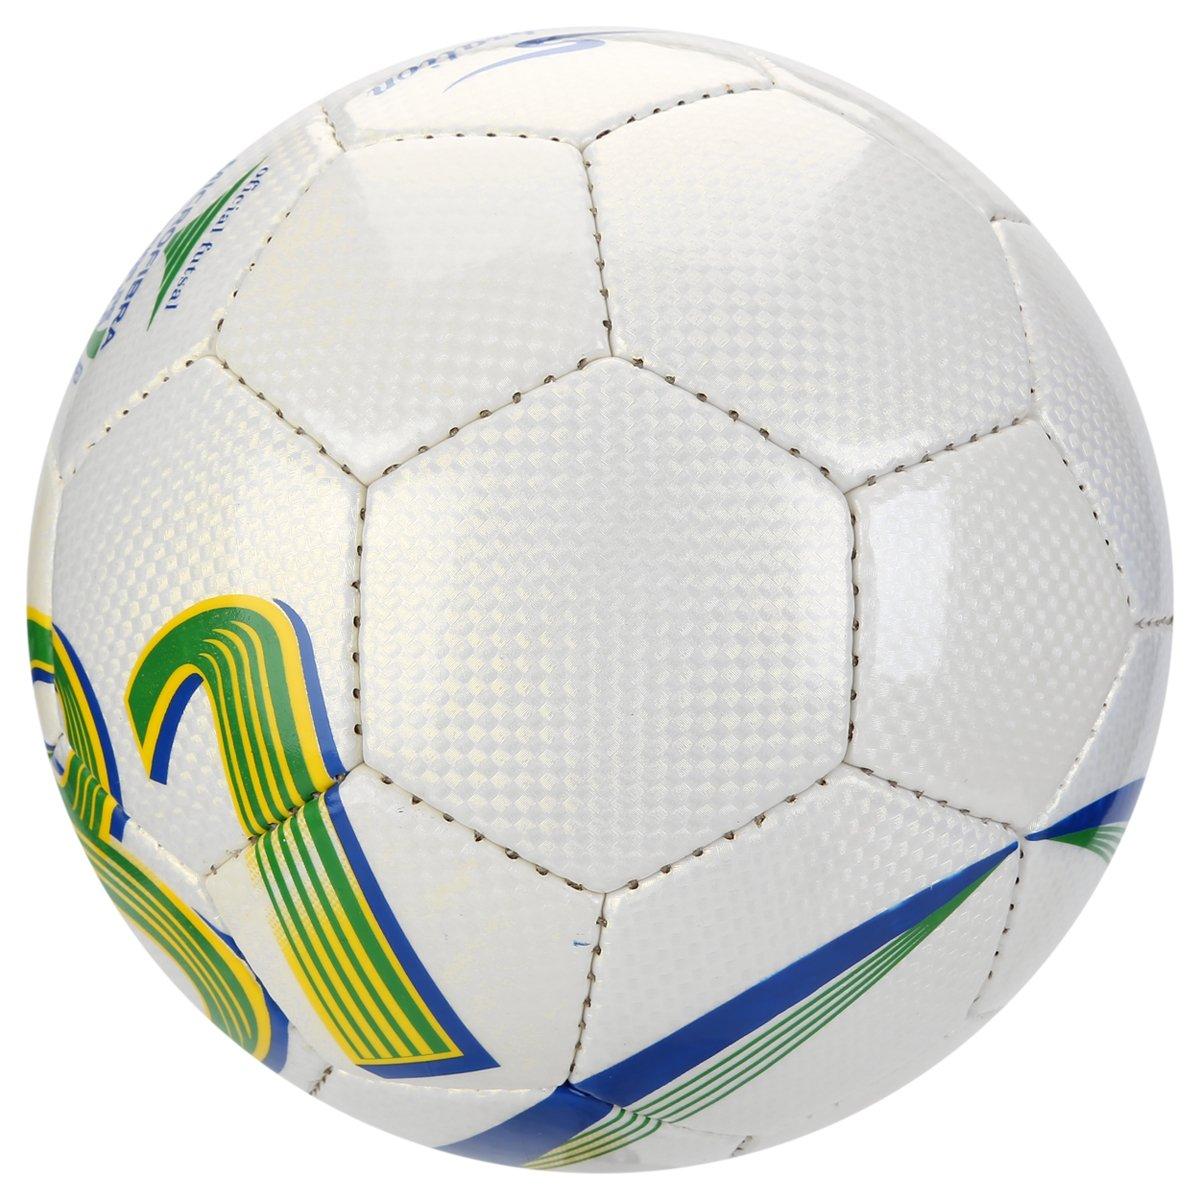 Bola Futebol Since 81 Celebration Futsal - Compre Agora  06383df1c693c